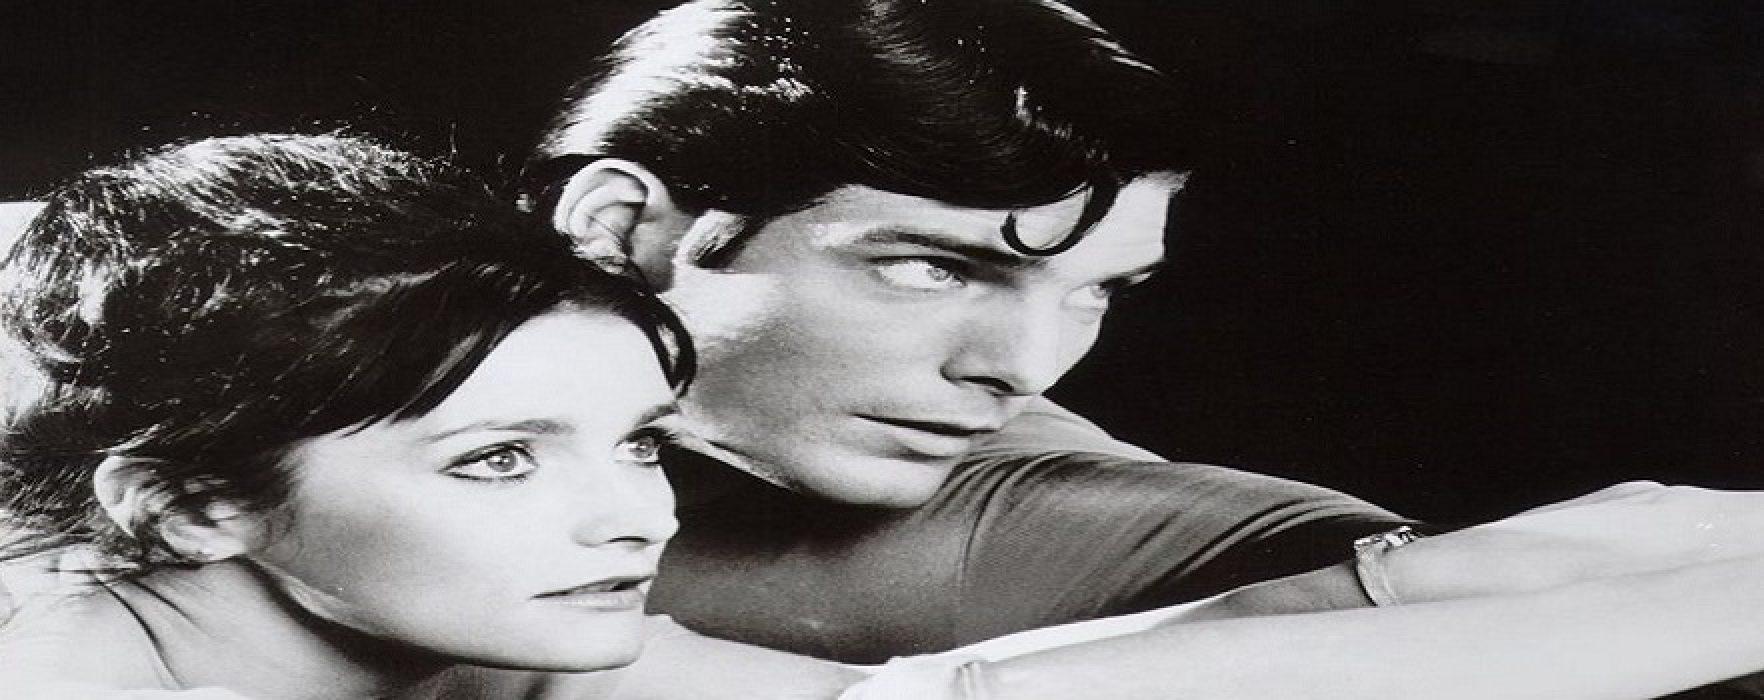 Margot Kidder of Superman Fame Has Died